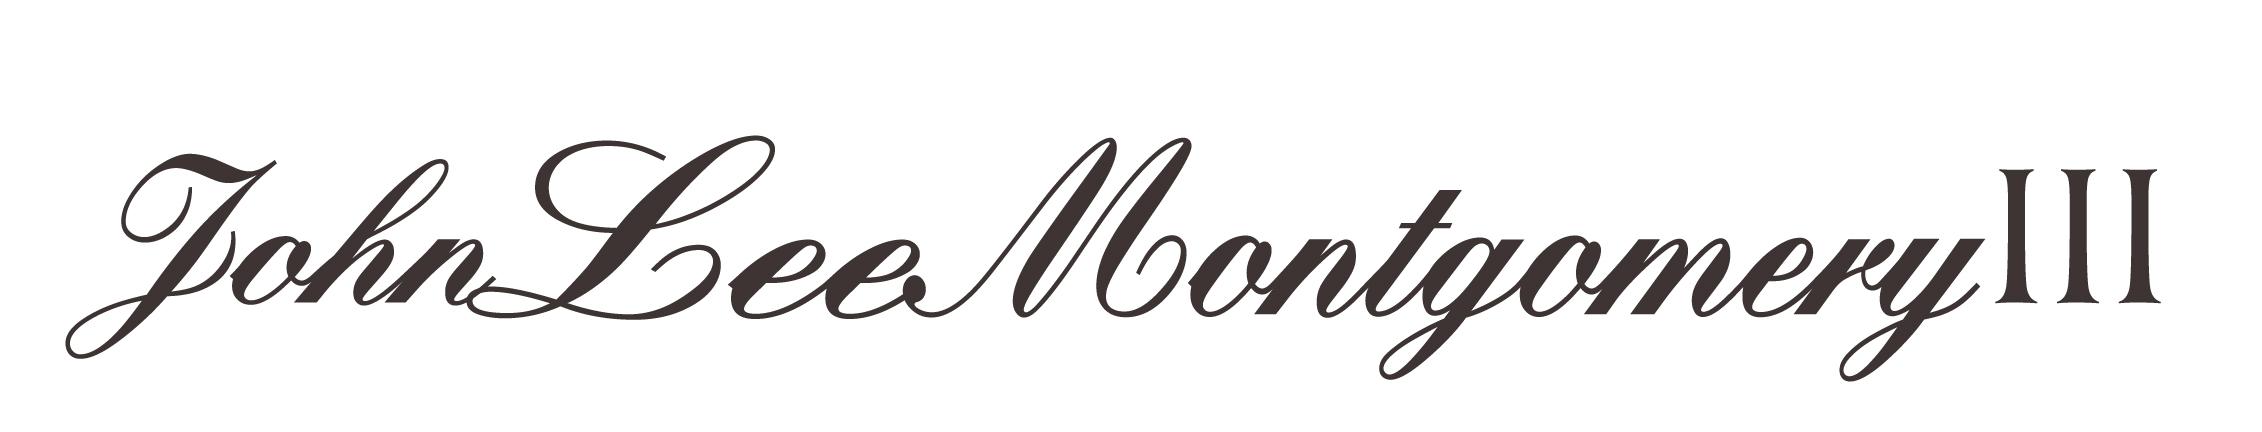 John Lee Montgomery III Signature